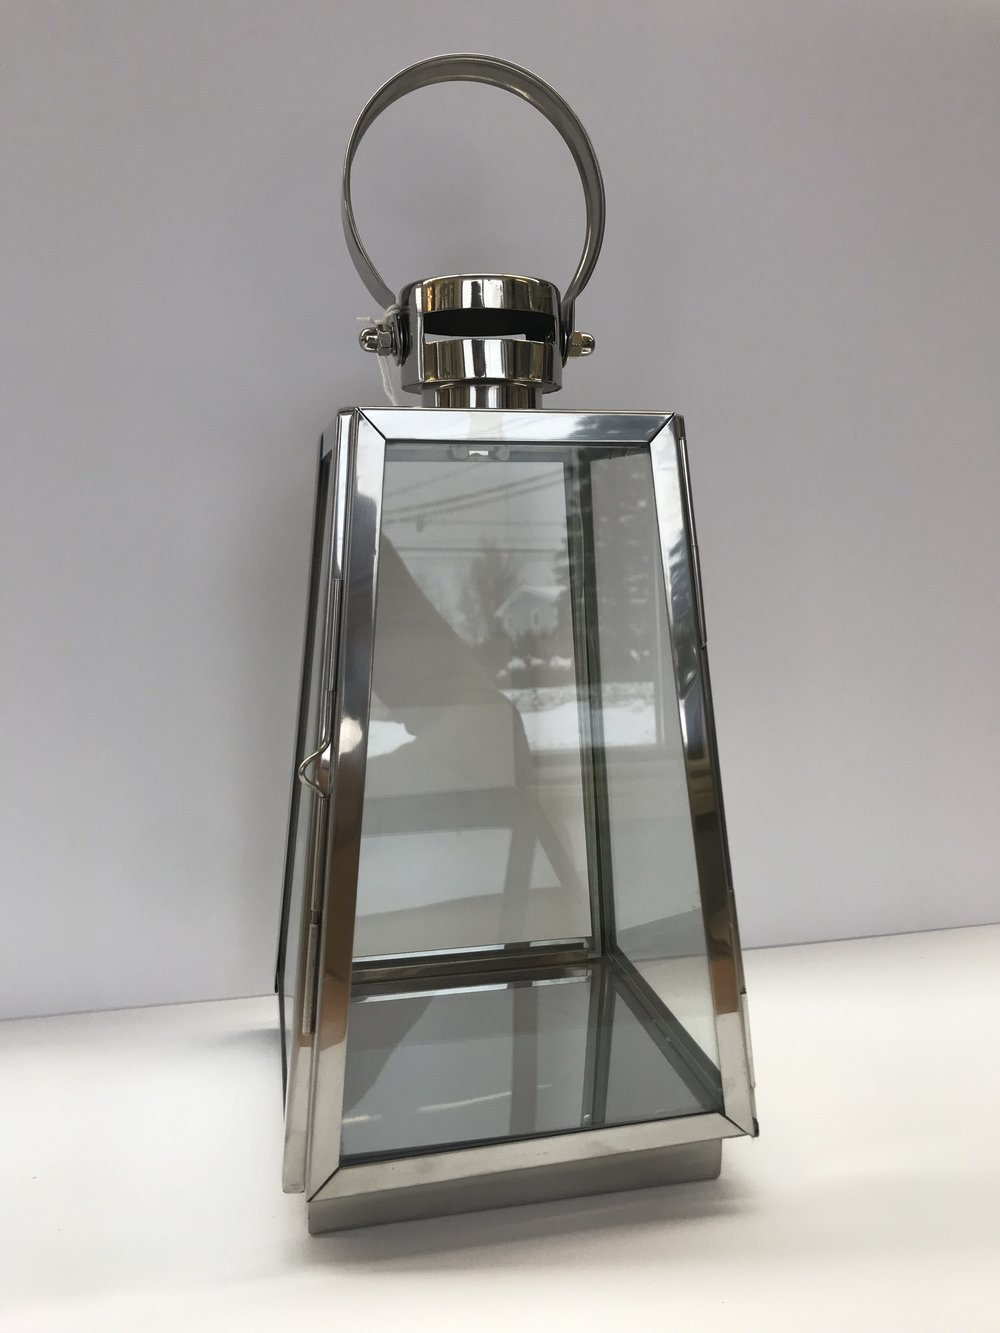 Stainless Steel Lantern - Colour:  Stainless SteelDimensions:  16